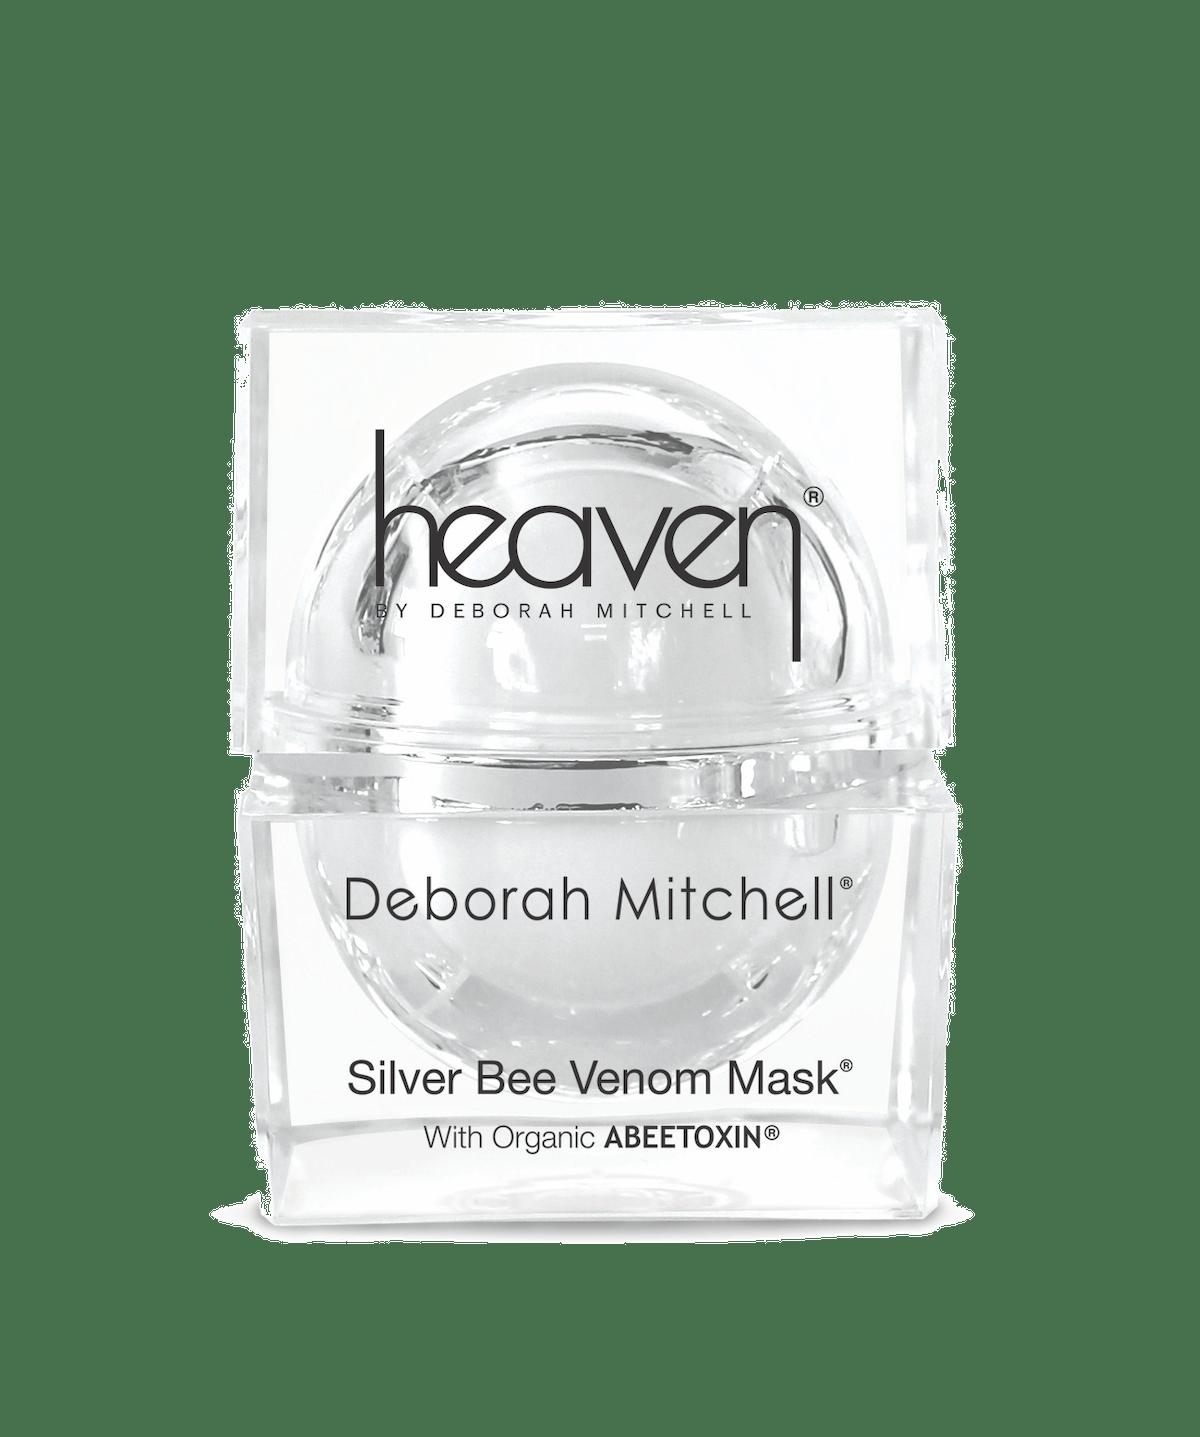 Silver Bee Venom Mask